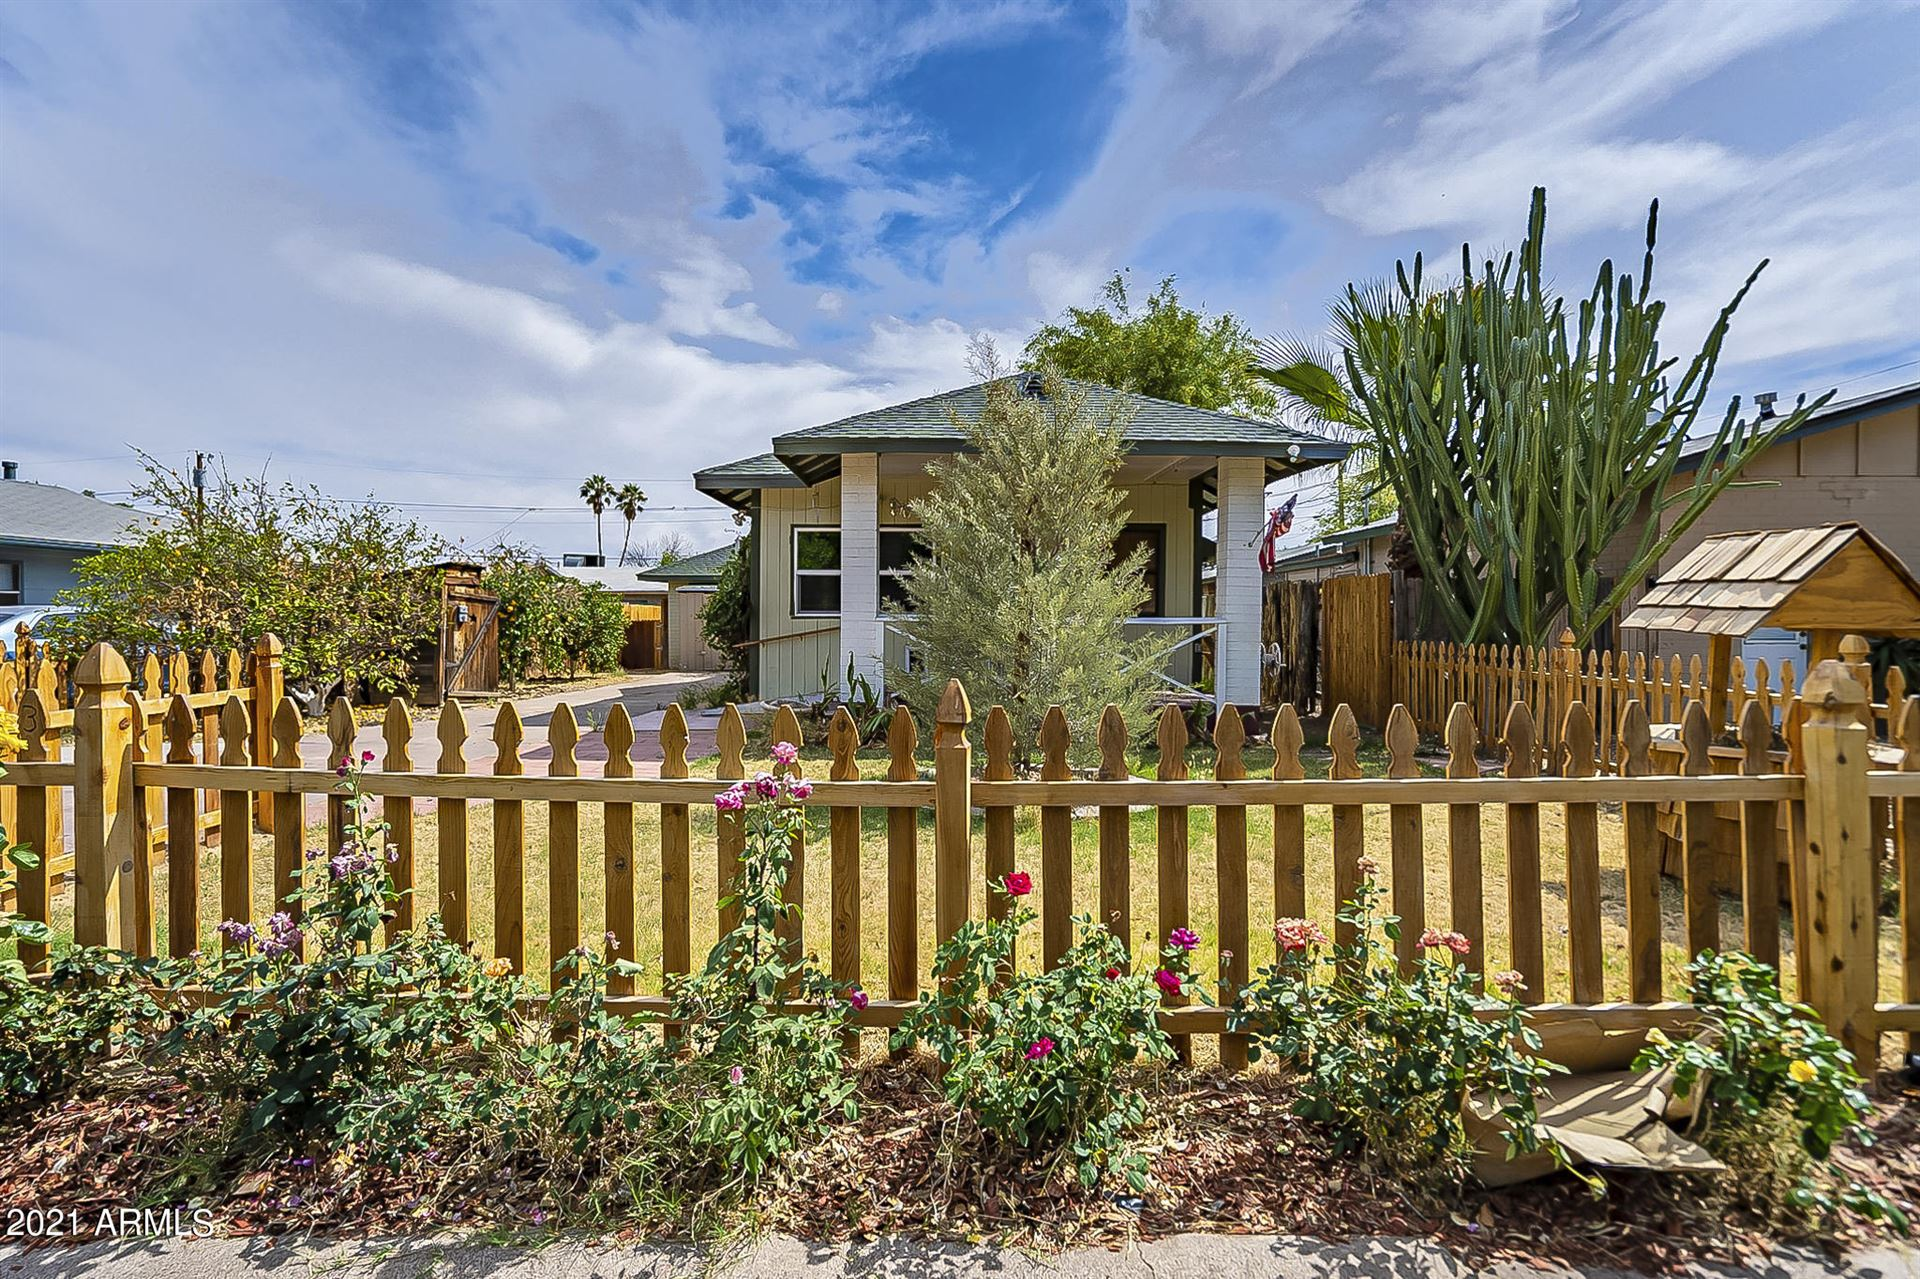 2143 W WILSHIRE Drive, Phoenix, AZ 85009 - MLS#: 6229596